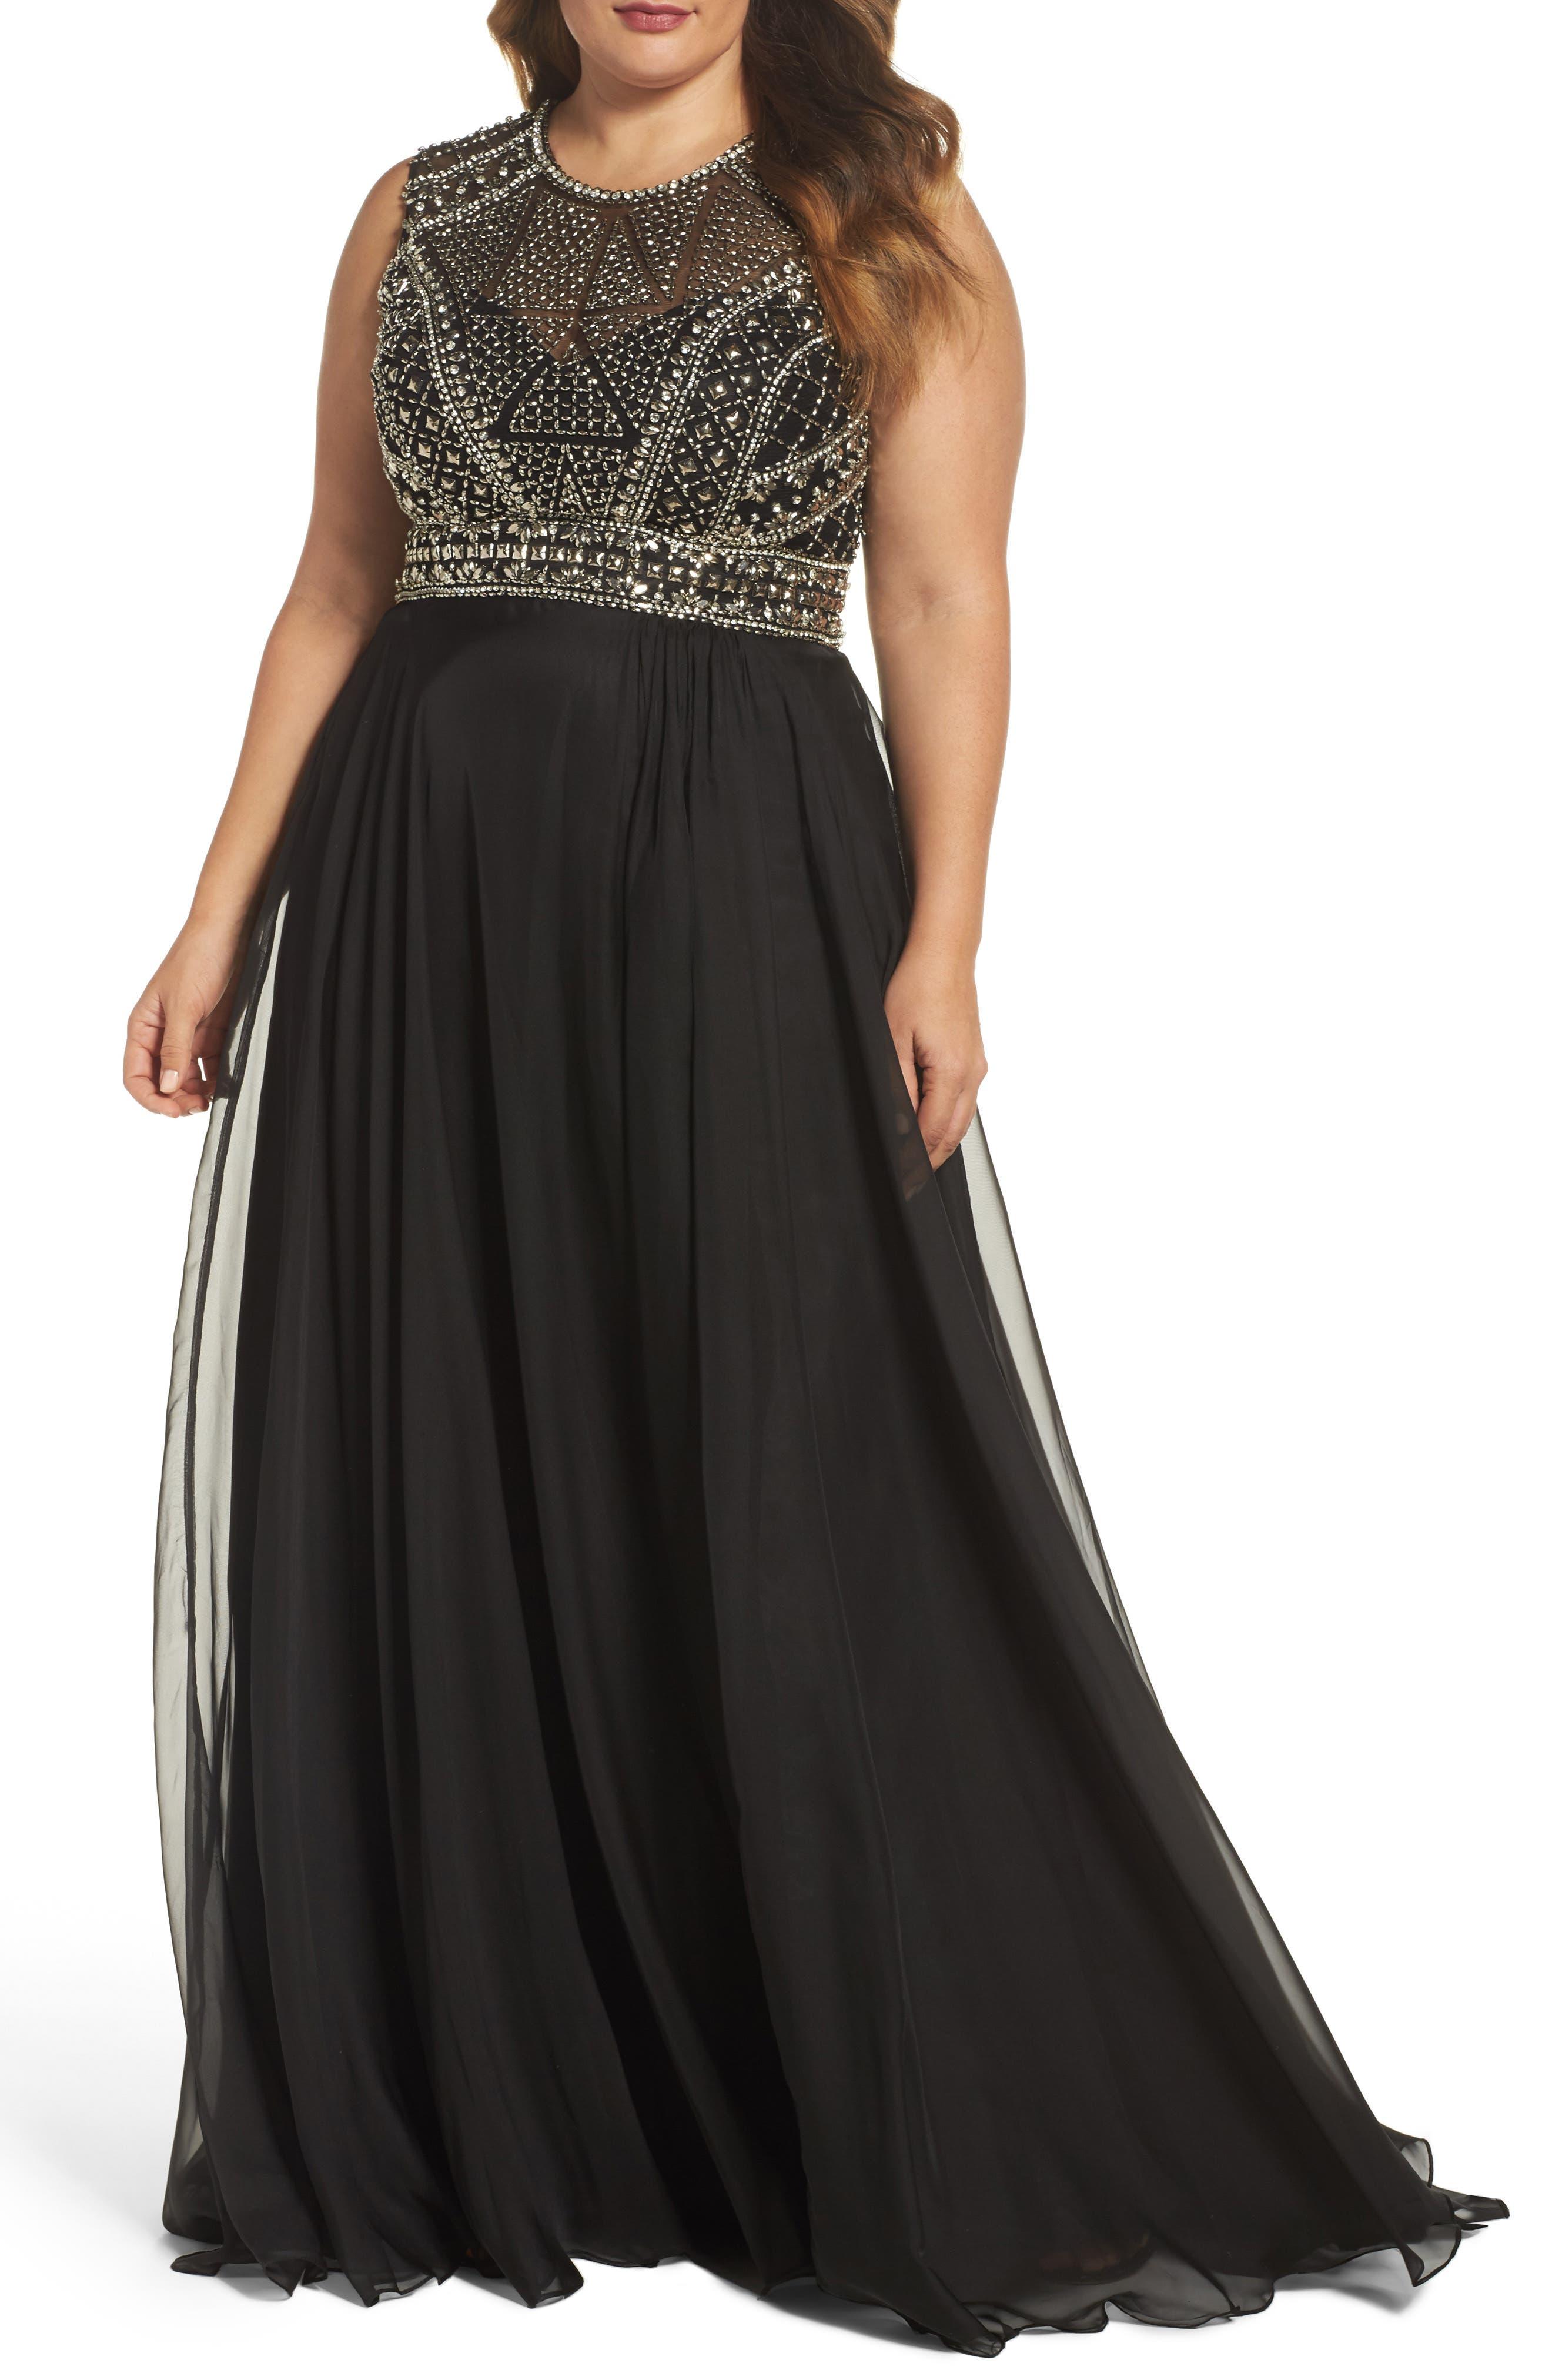 Main Image - Mac Duggal Embellished Ballgown (Plus Size)